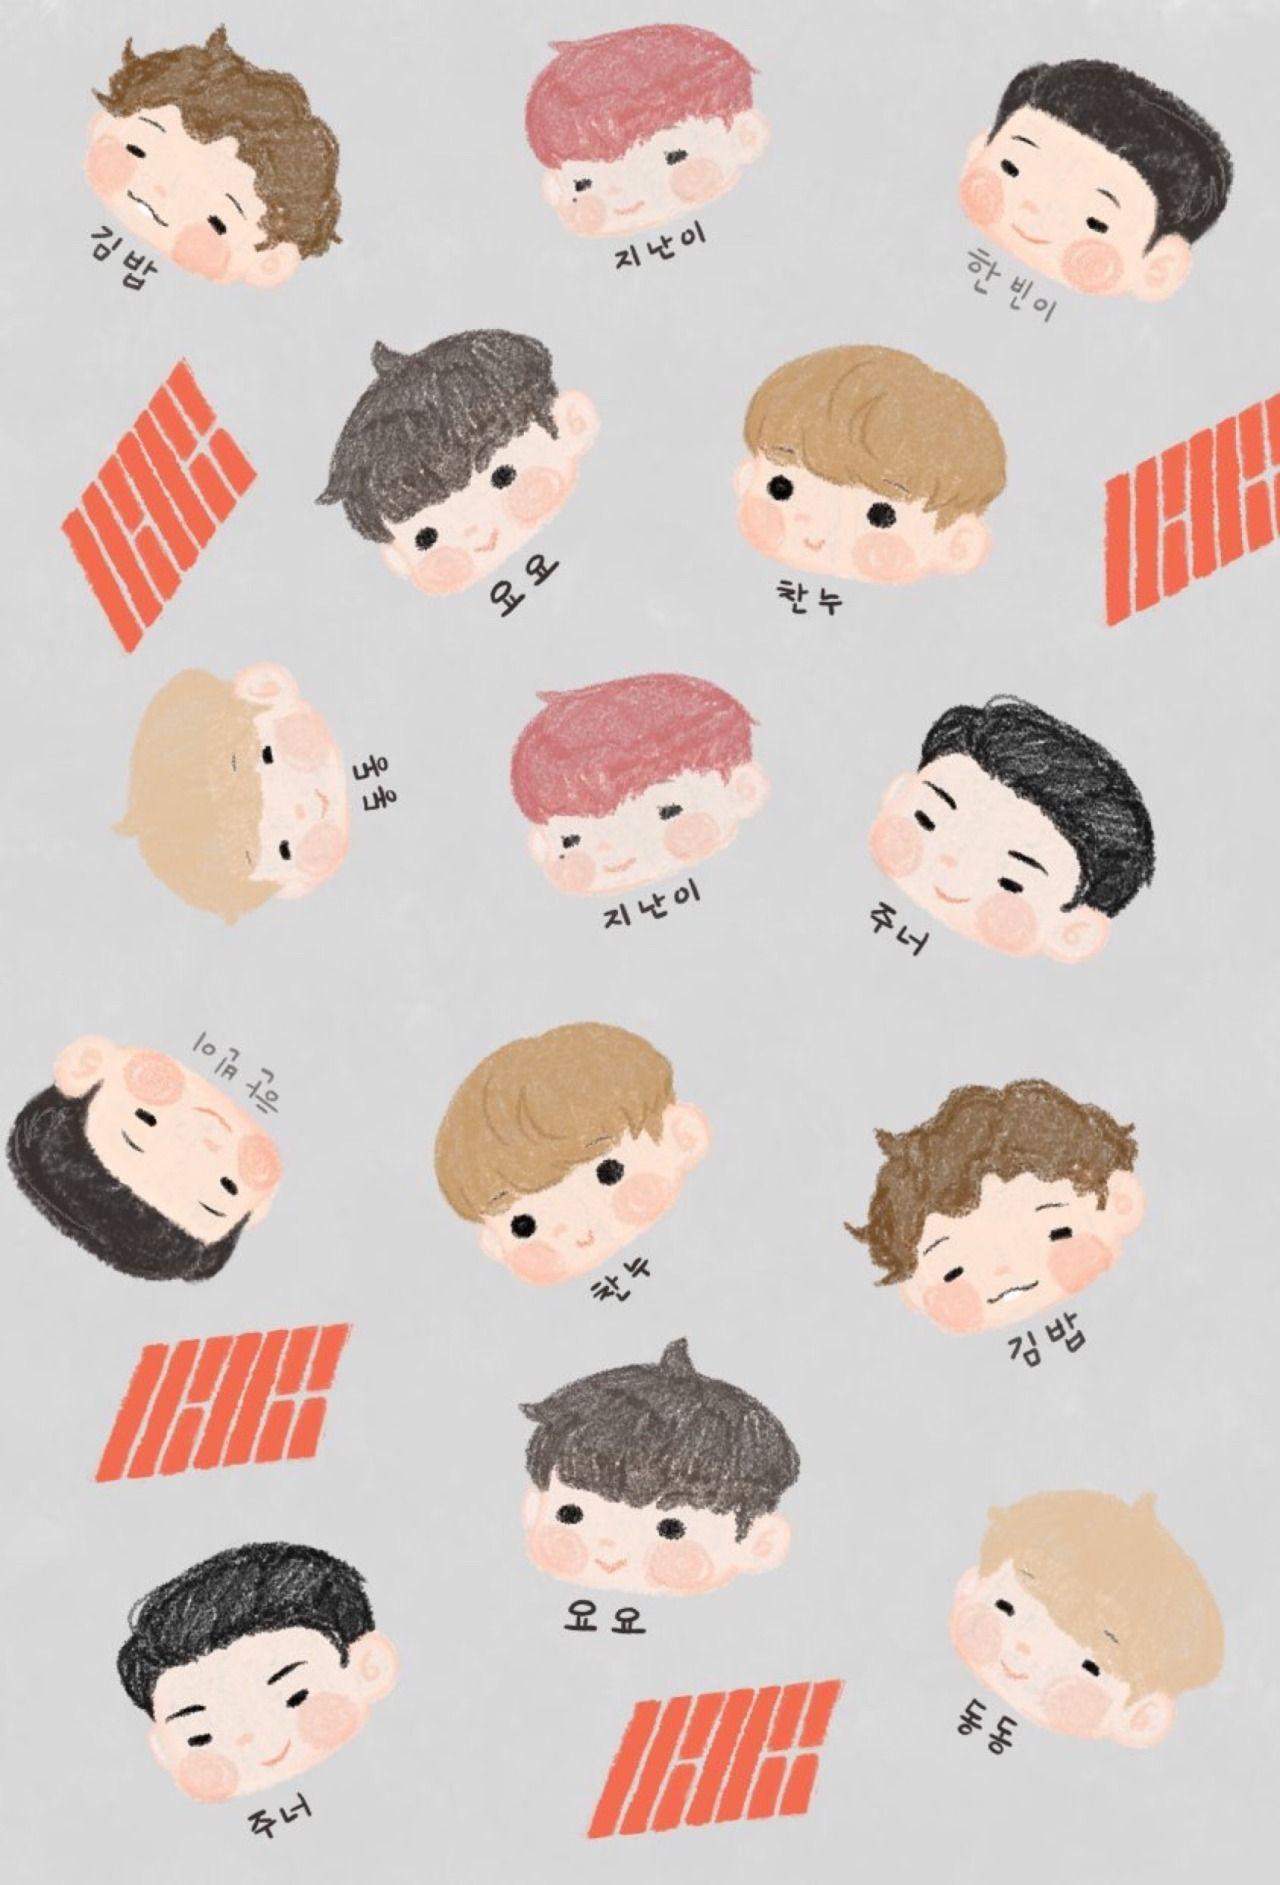 Cute iKON Wallpaper Cr wacoog99 ภาพ